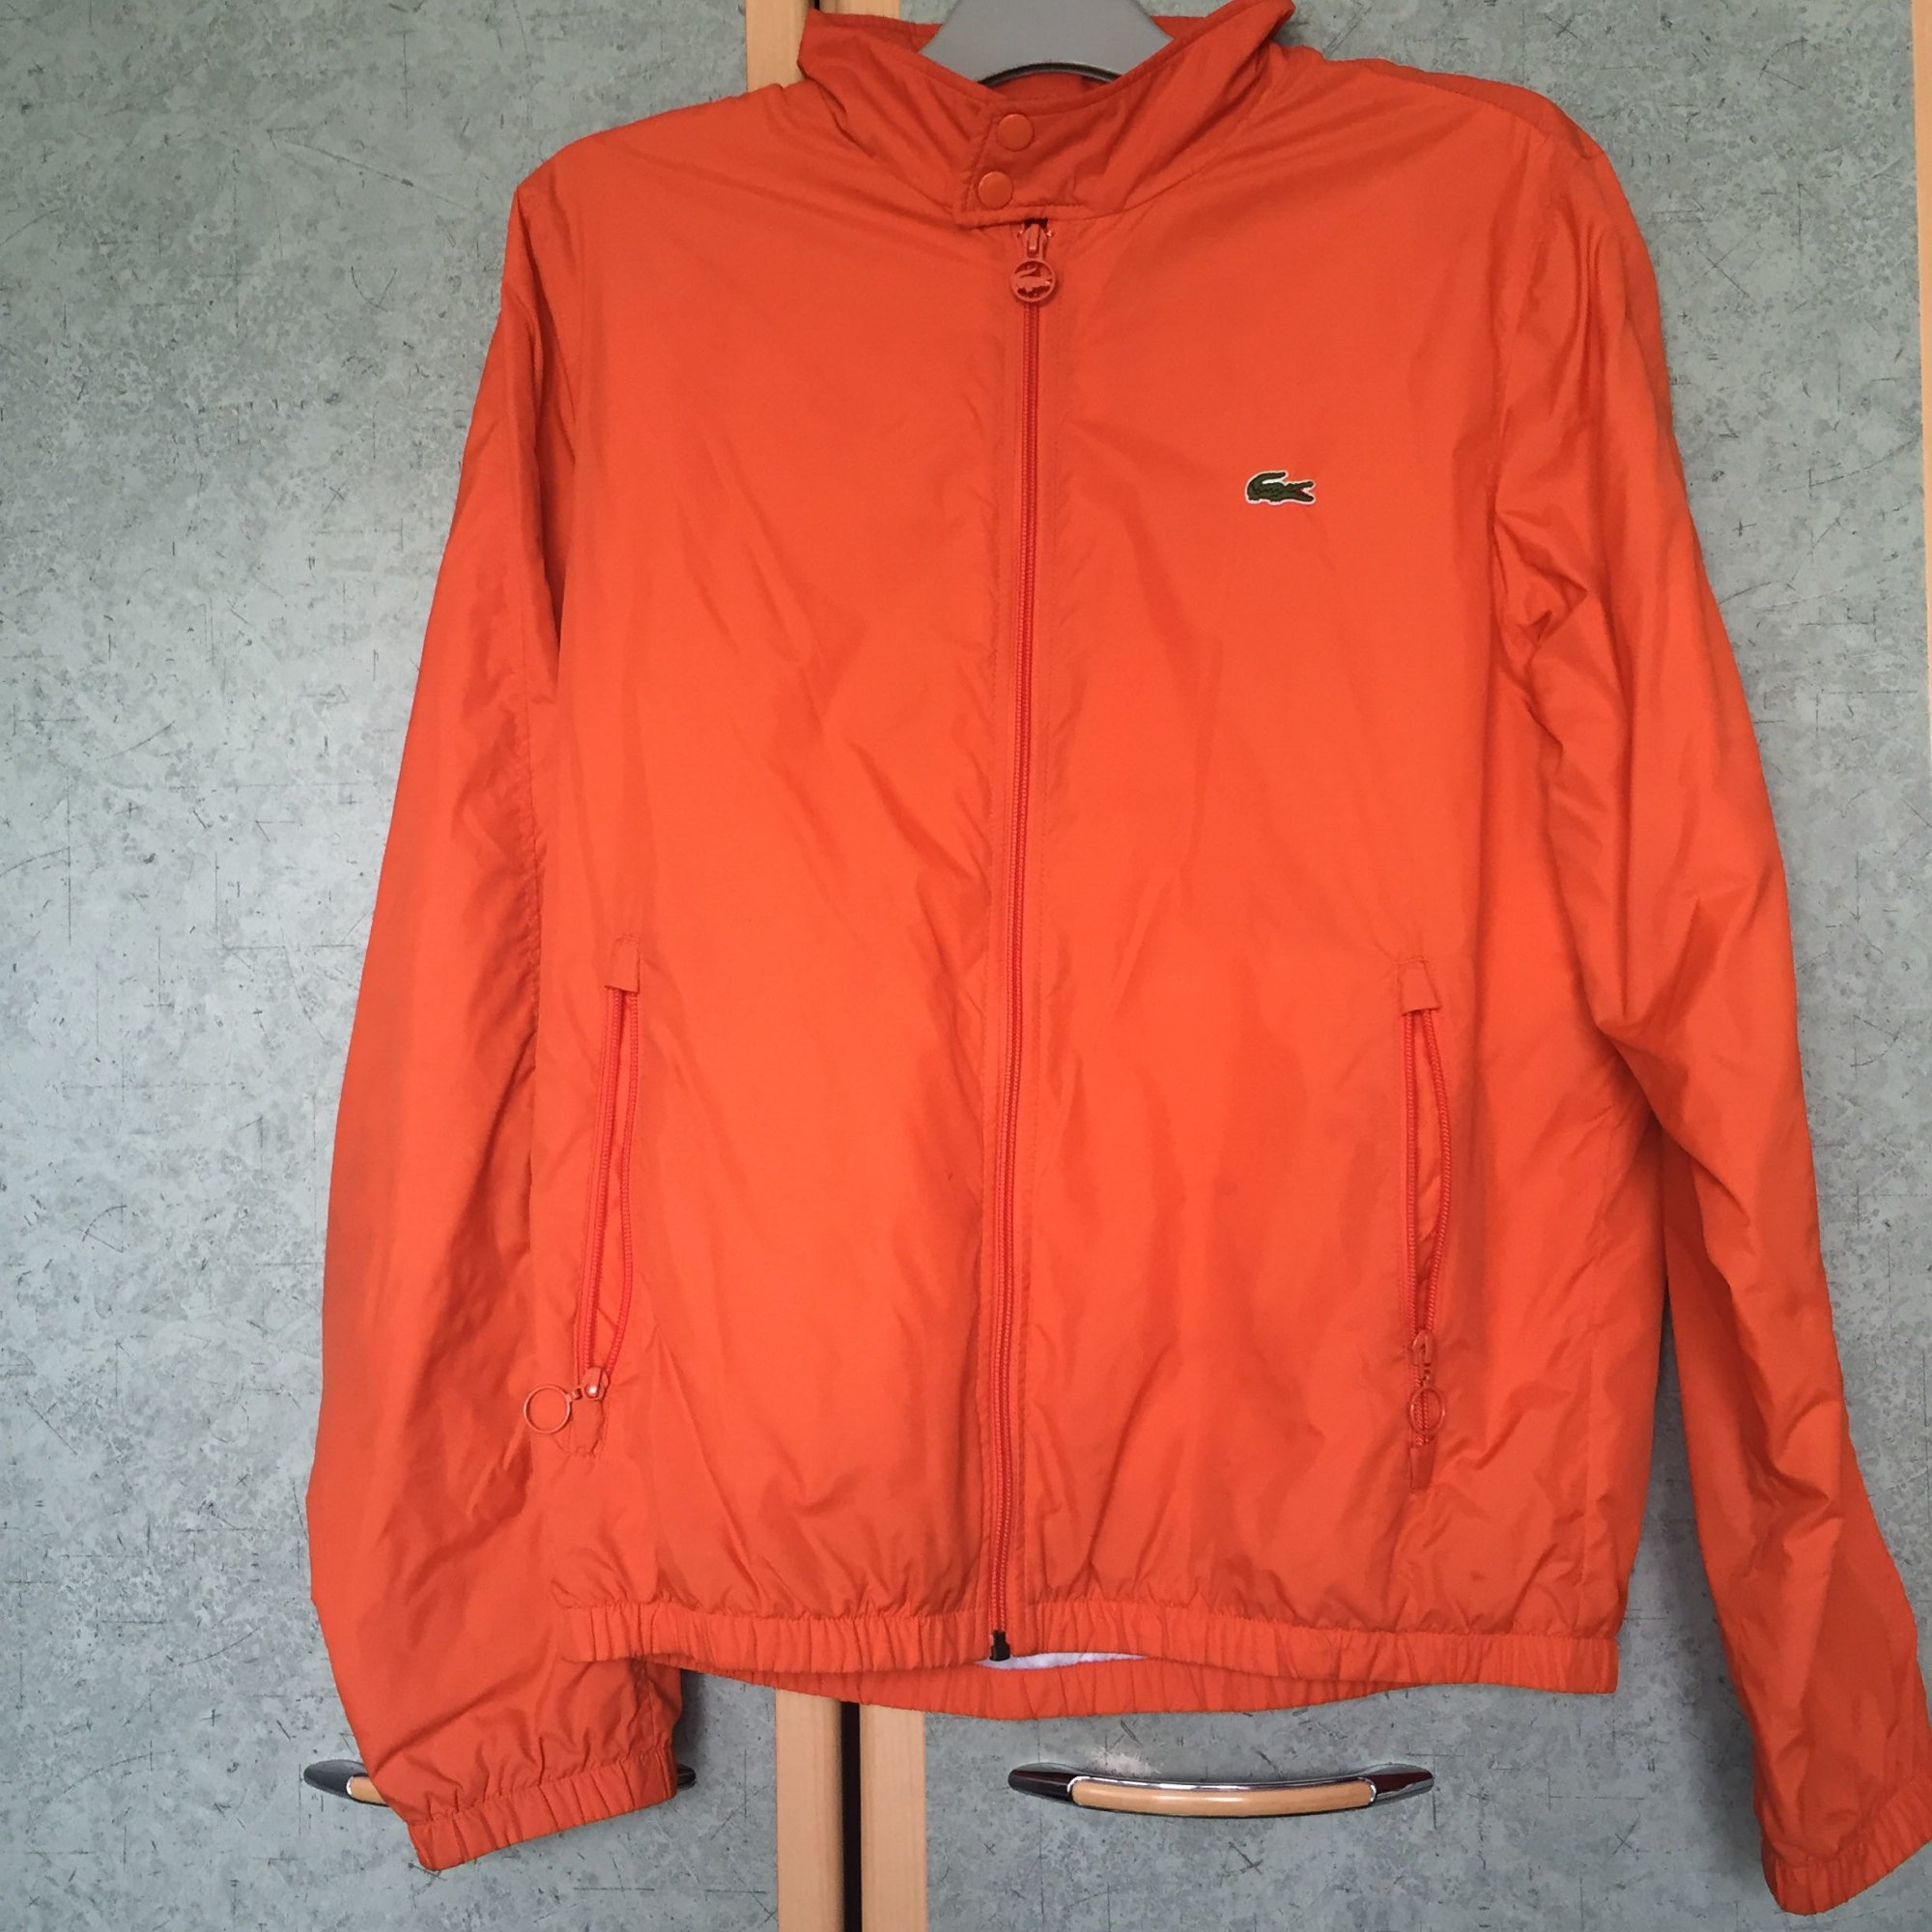 8945c50a2f Veste LACOSTE 50 (M) orange vendu par Sneaker - 4779883